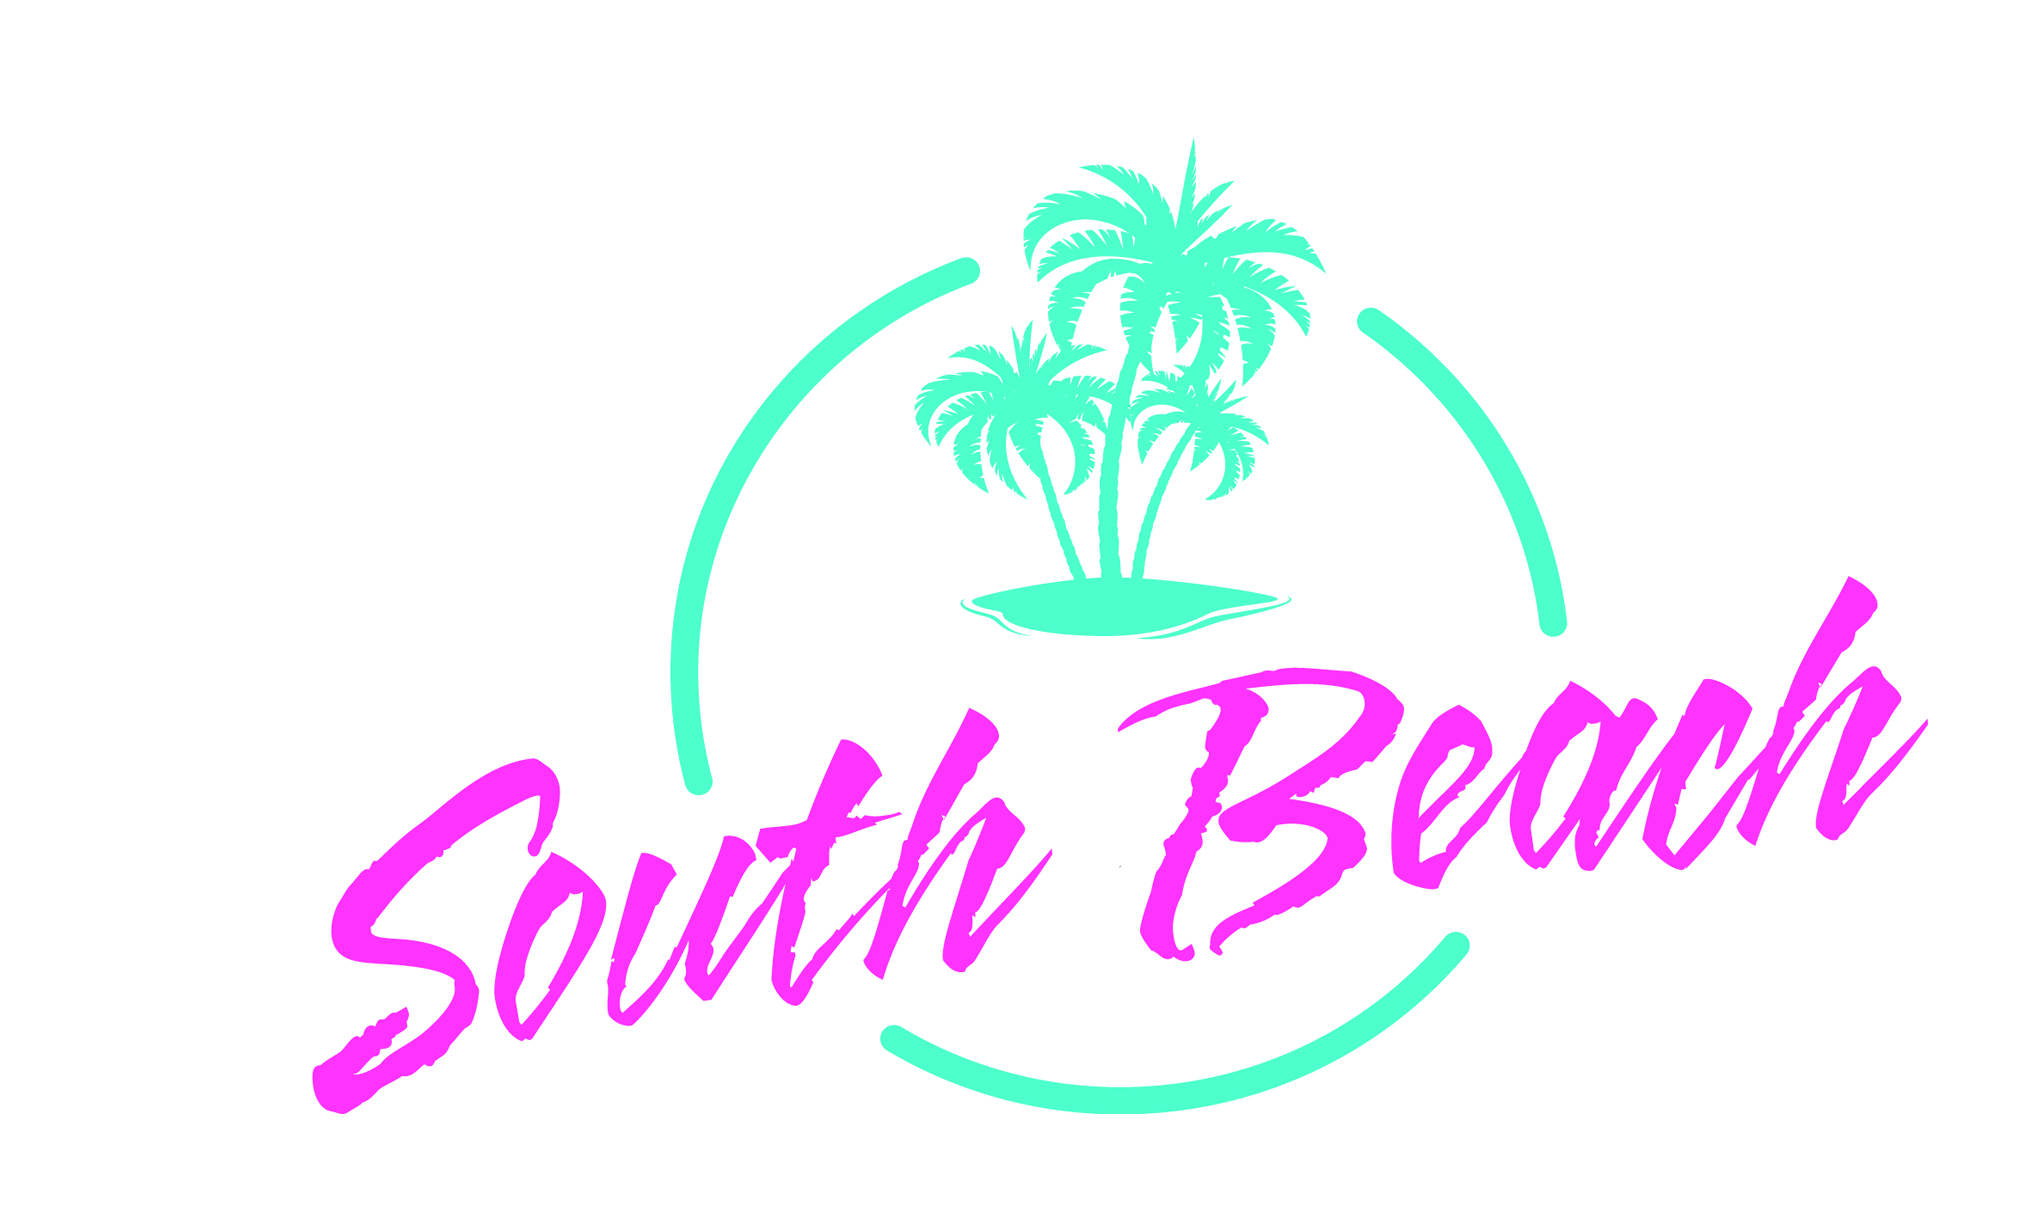 South beach logo : Phase one logo